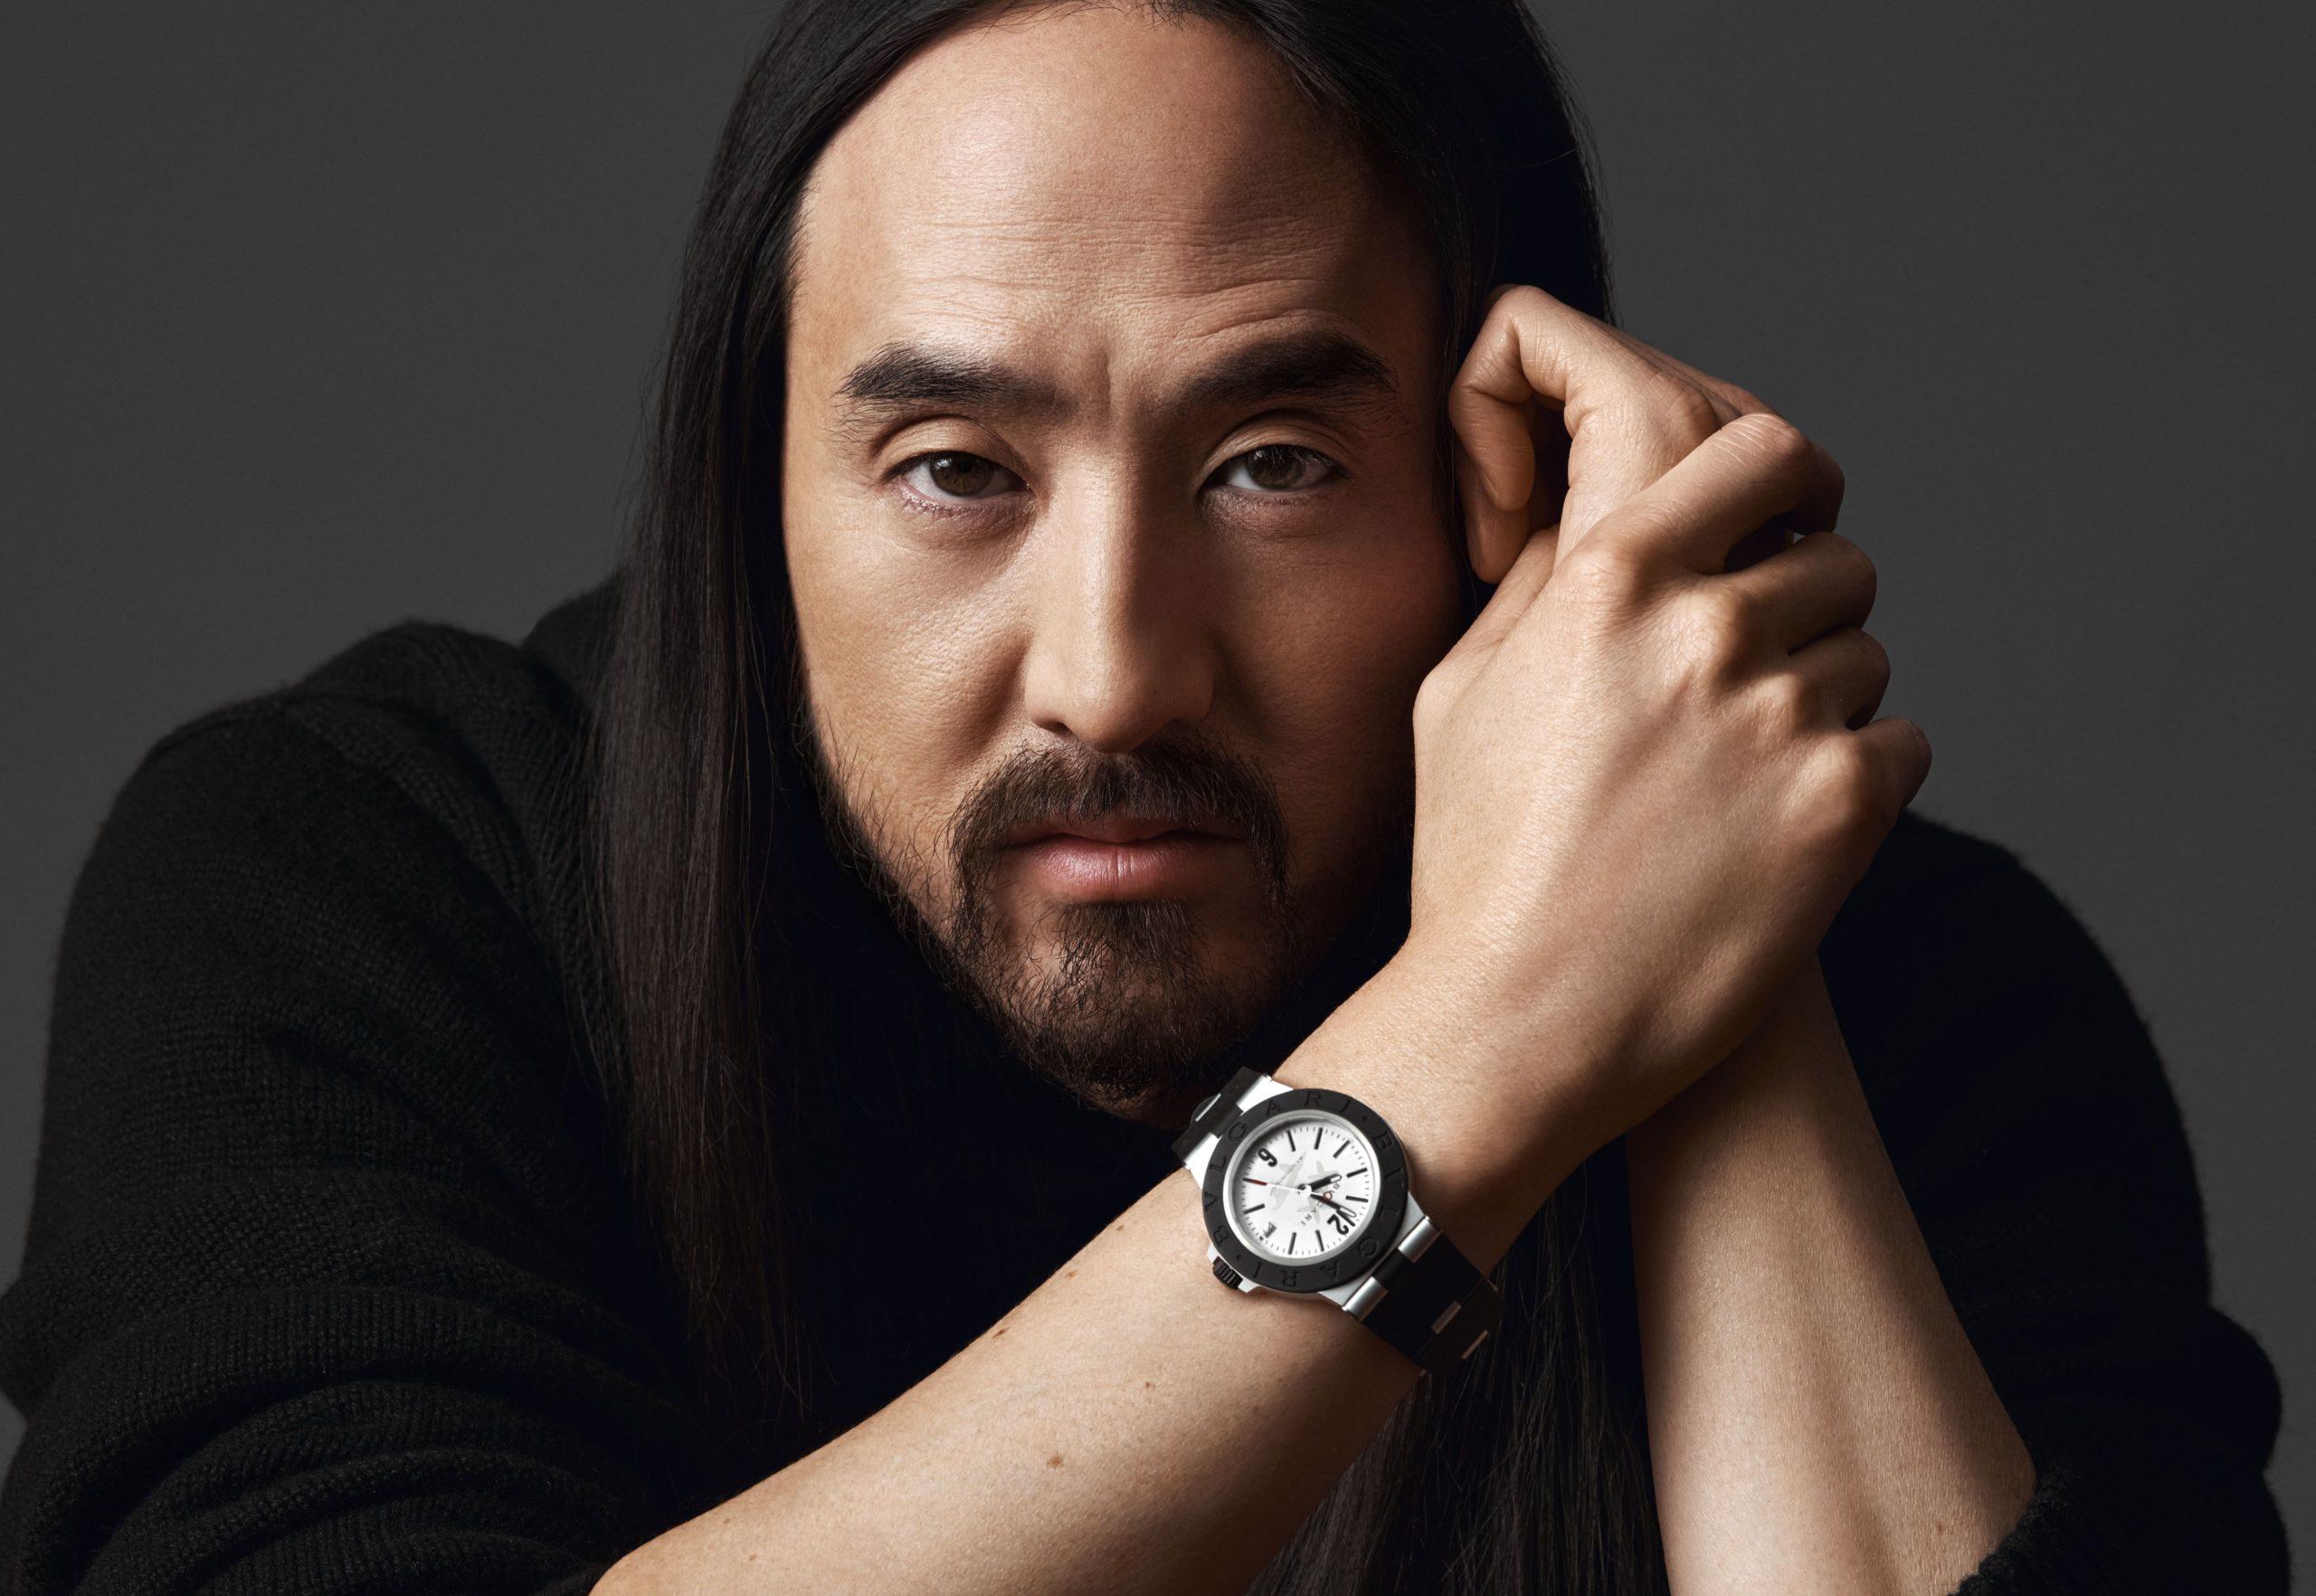 Bulgari Aluminium Steve Aoki Pays Homage To The Globally-Renowned DJ